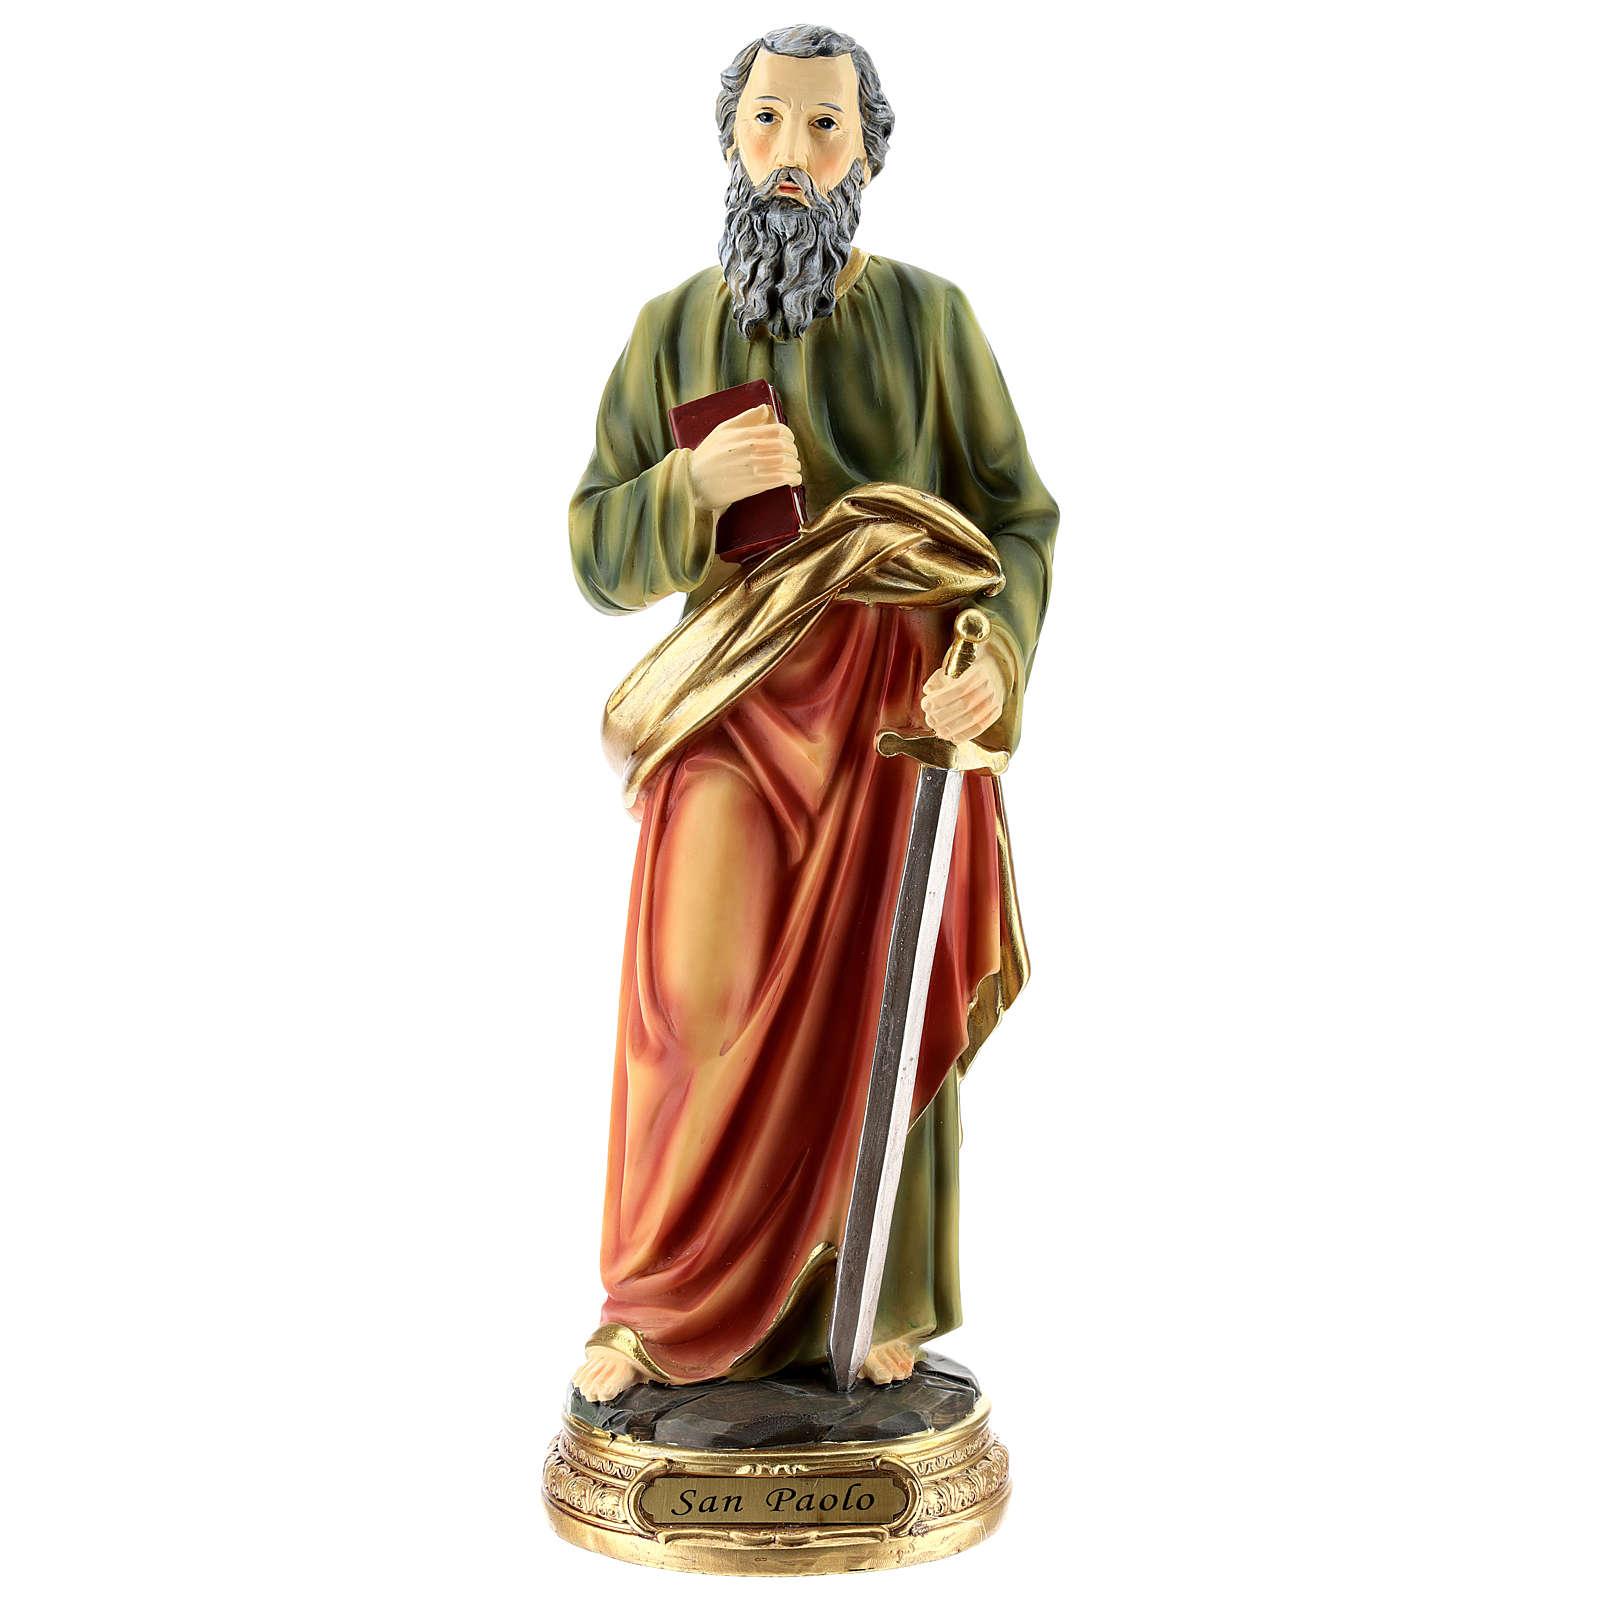 San Paolo statua resina di 30 cm 4